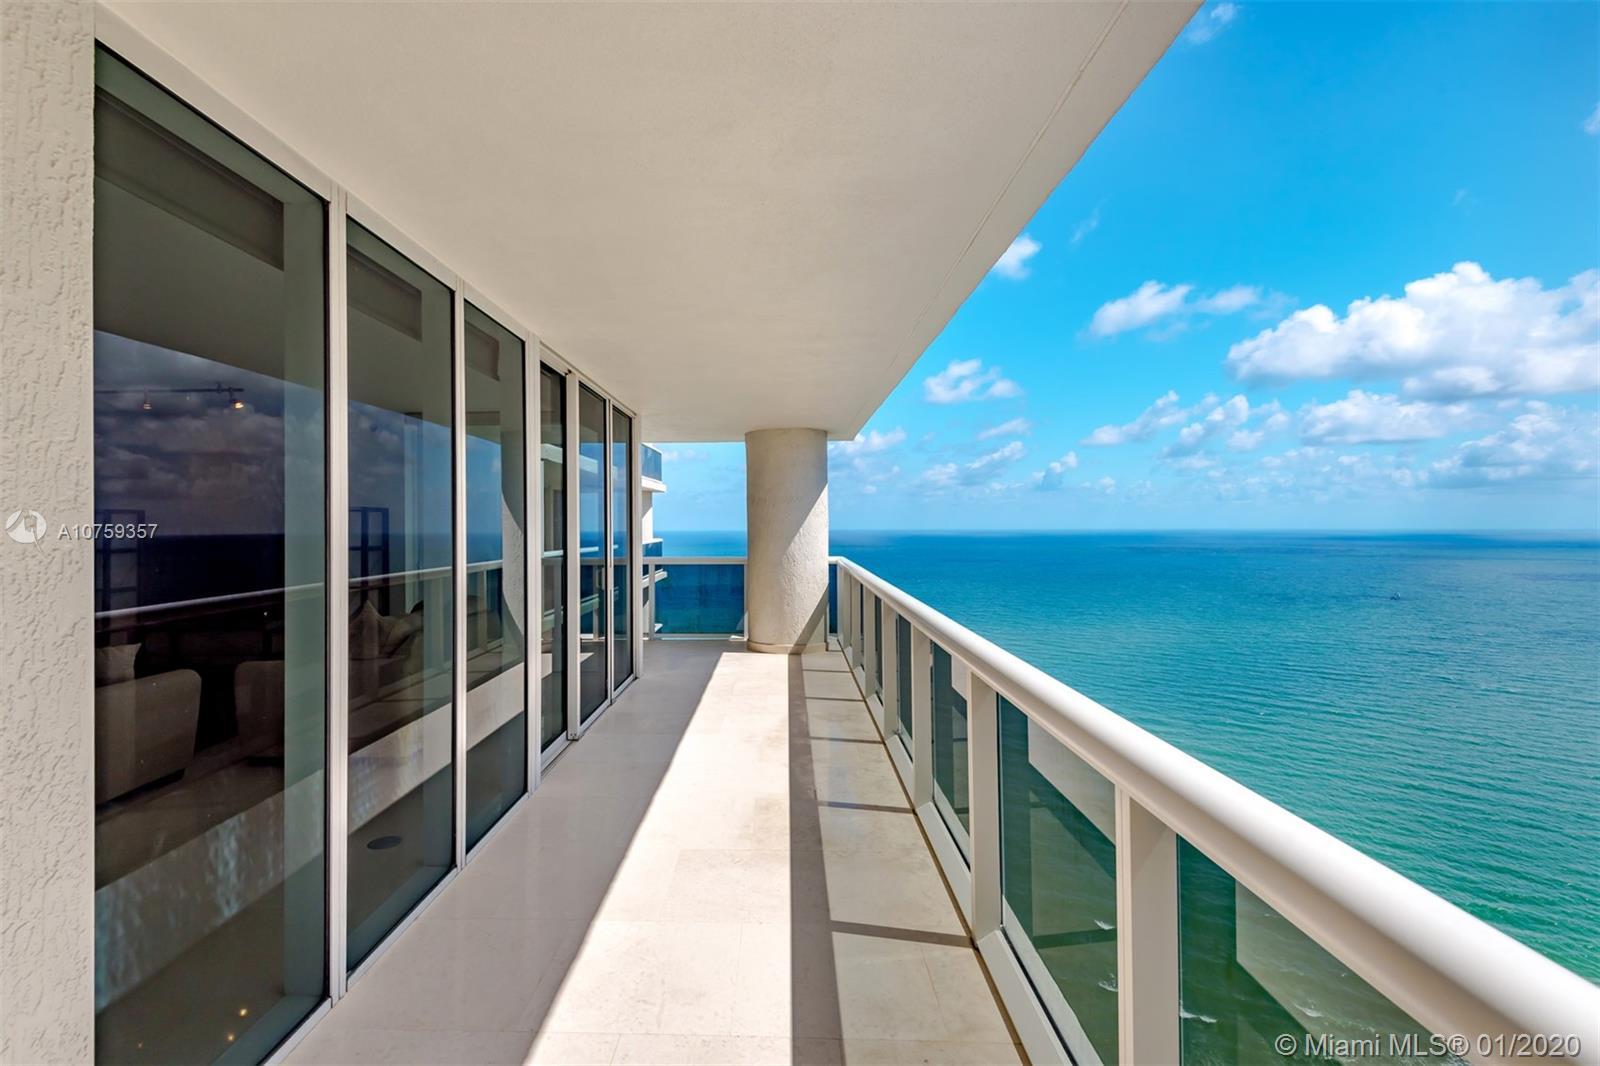 Beach Club Towers #4305 - 01 - photo